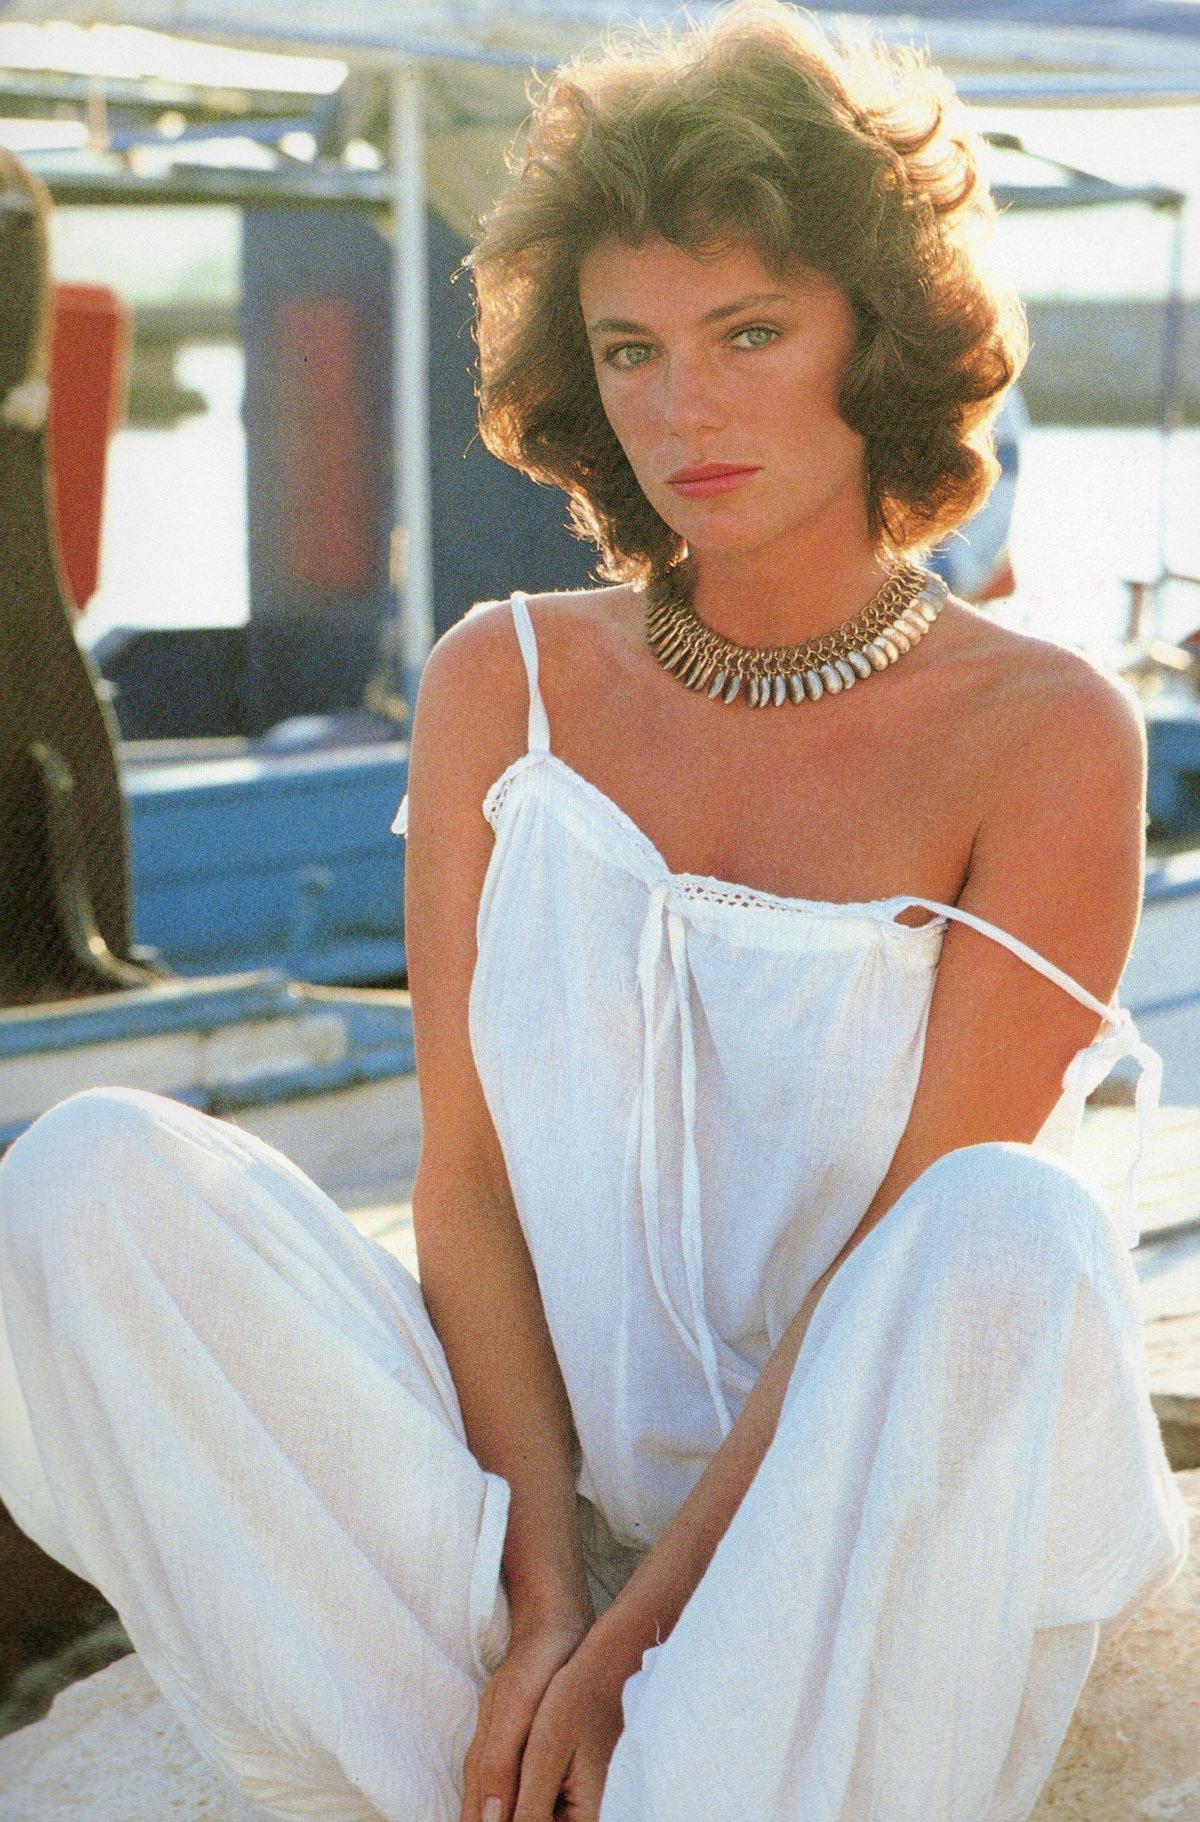 Jacqueline Bisset photo gallery - 113 high quality pics of Jacqueline ... Victoria Beckham